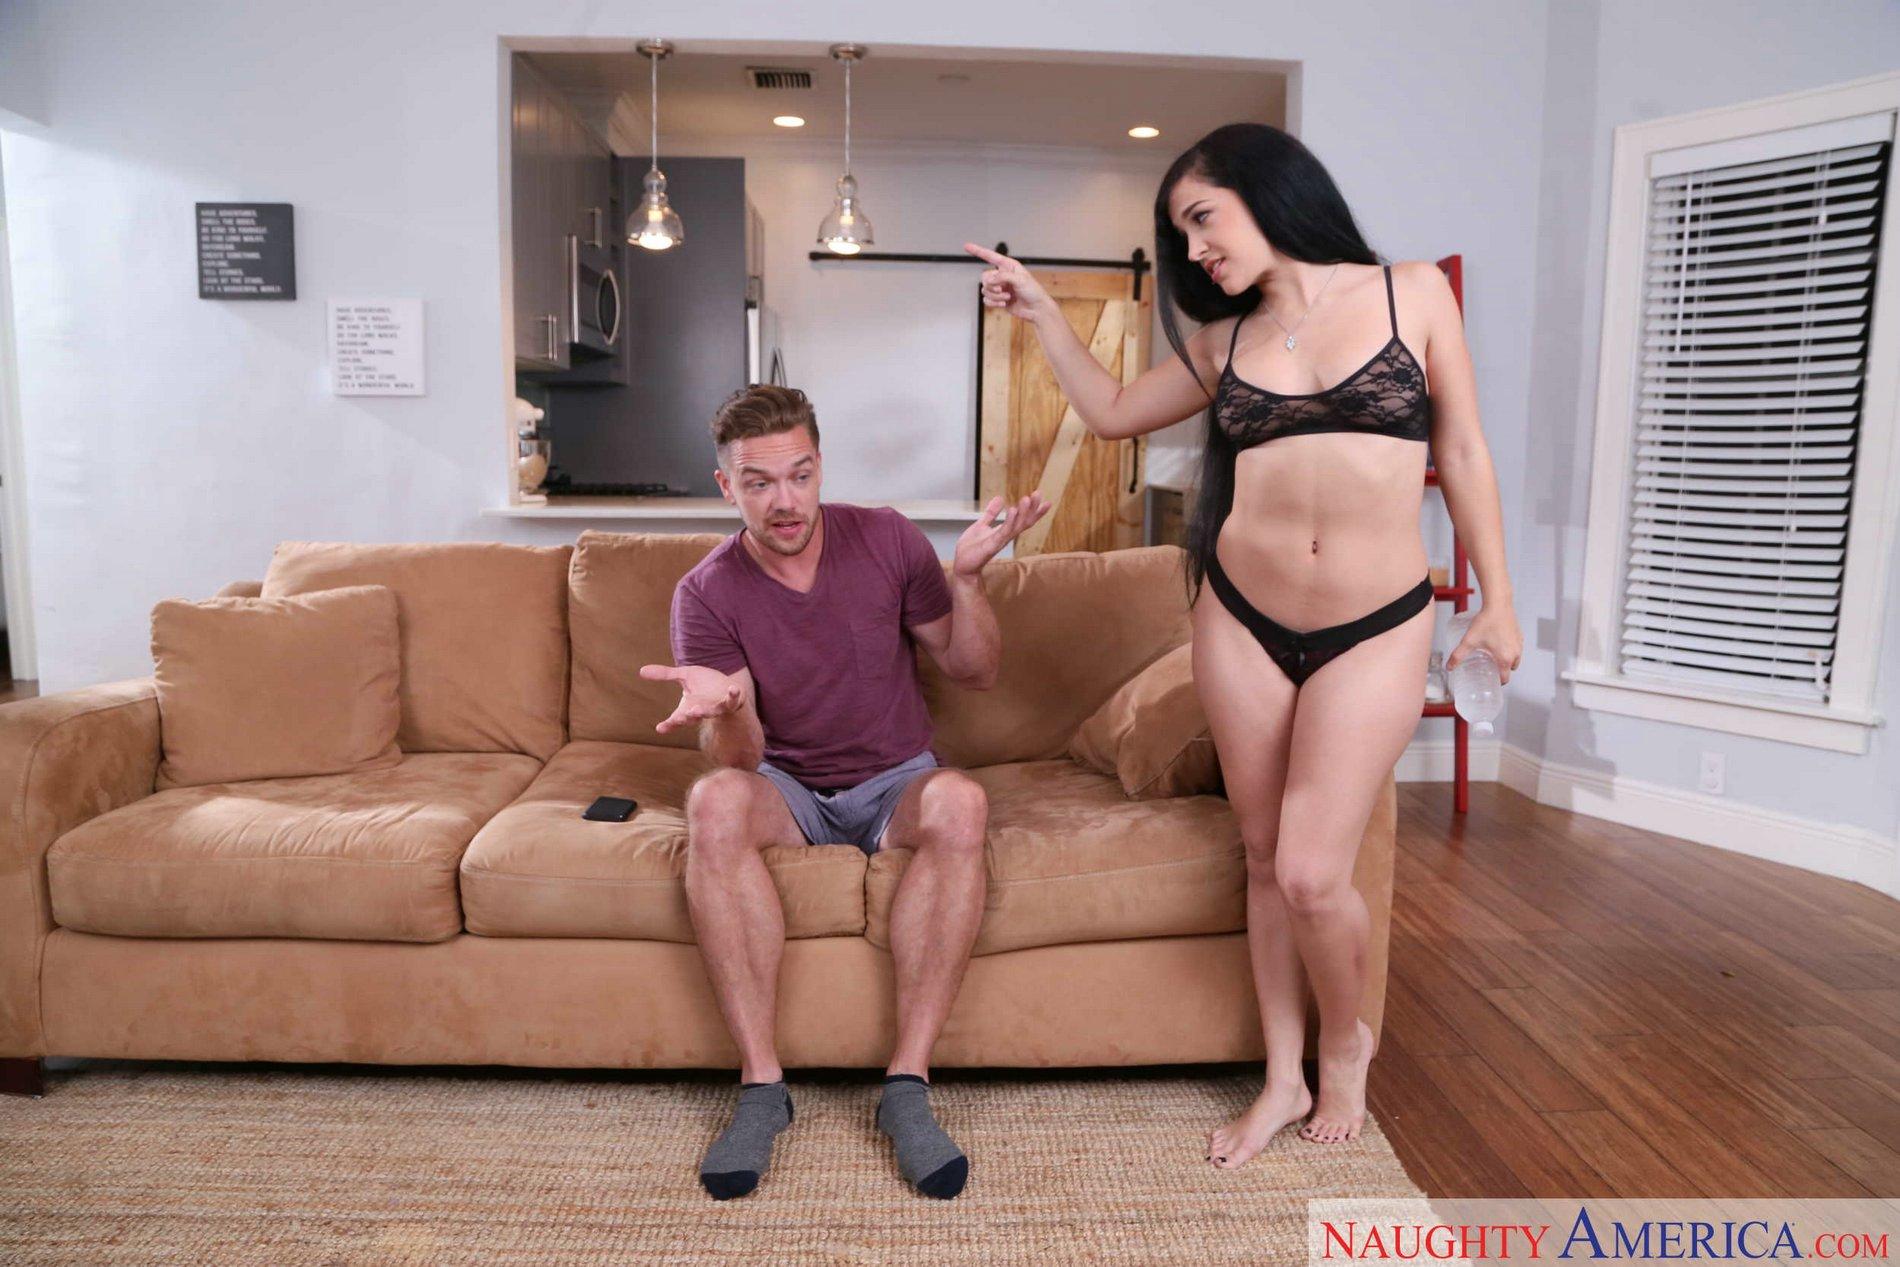 Annika Eve annika eve getting fucked hard on couch - my pornstar book